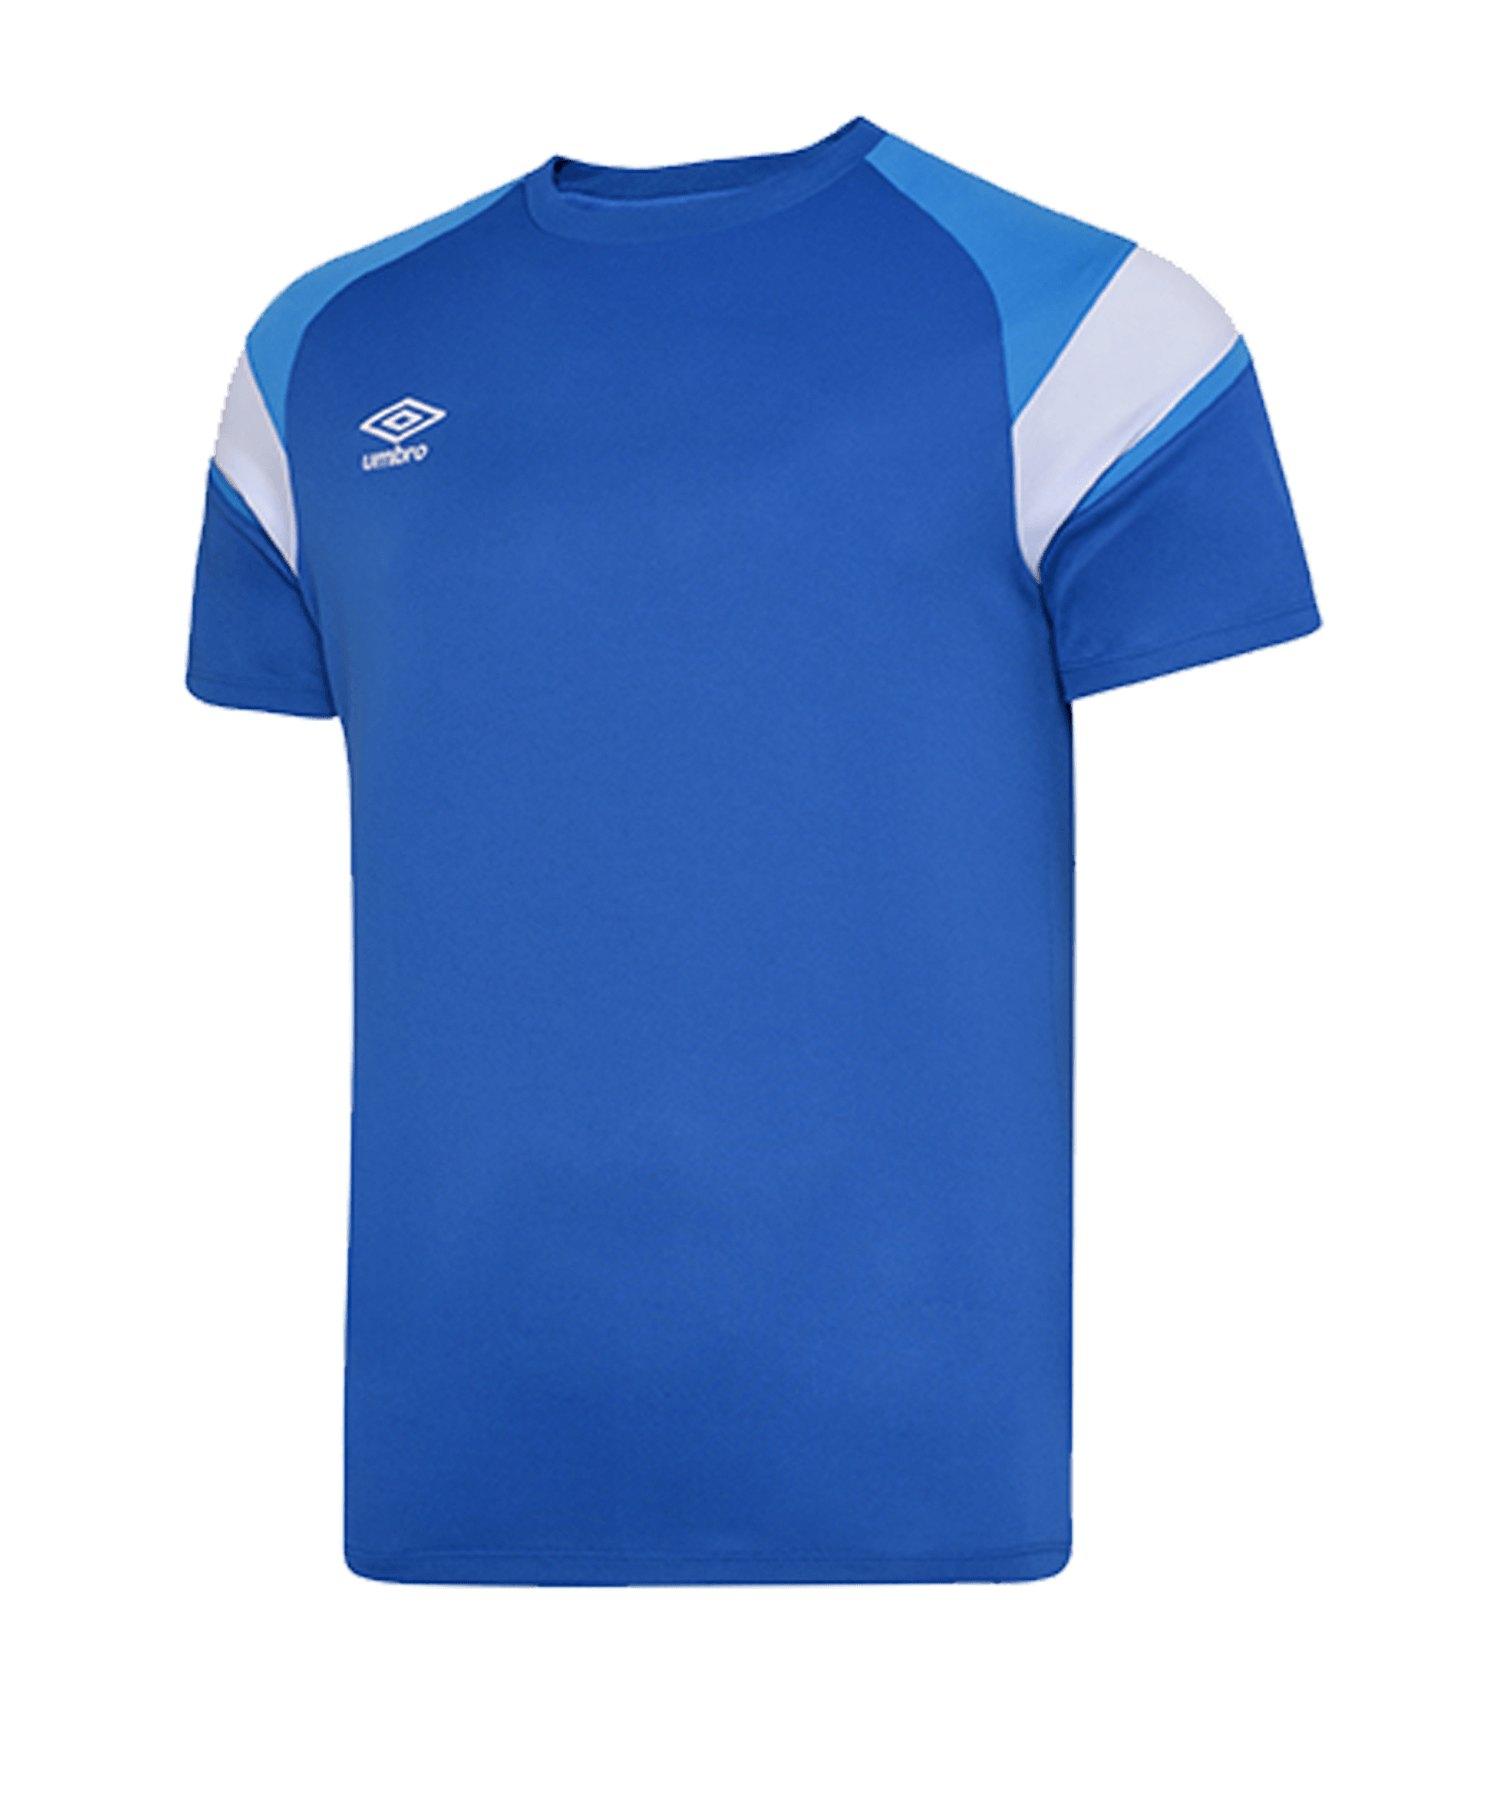 Umbro Training Jersey Trikot Blau FGQW - blau